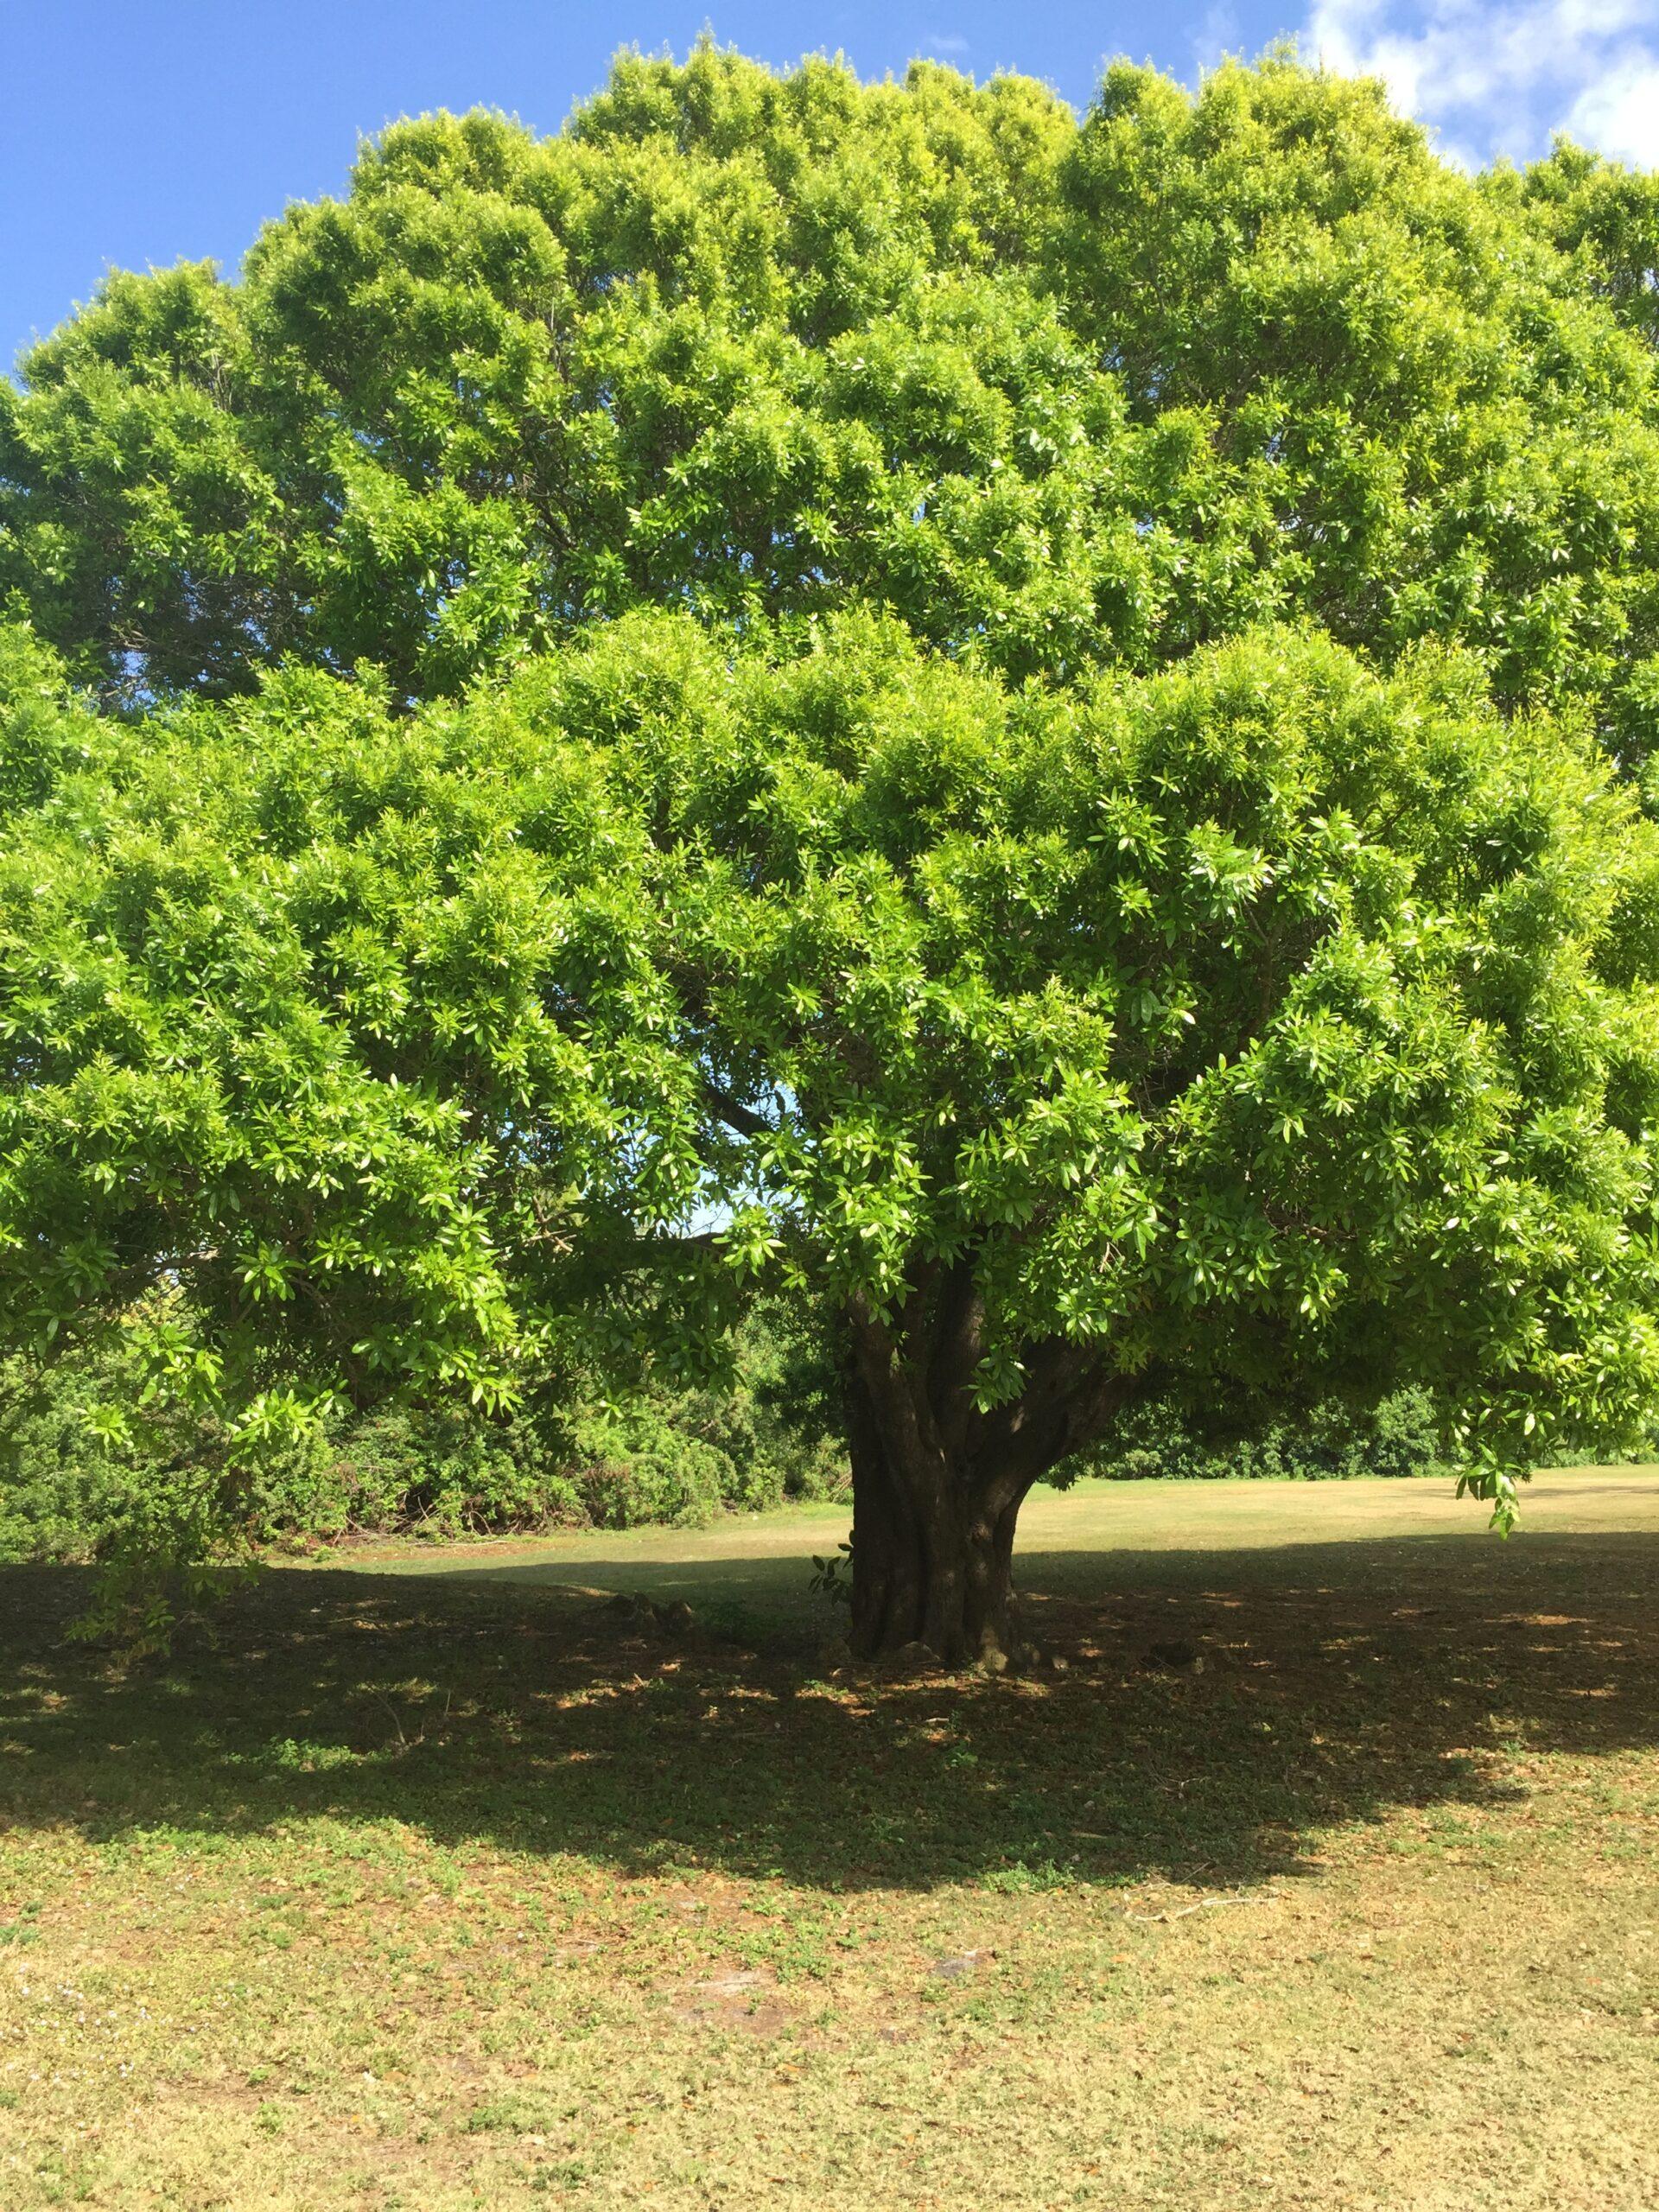 Laurel Oak on Coral Oaks Golf Course